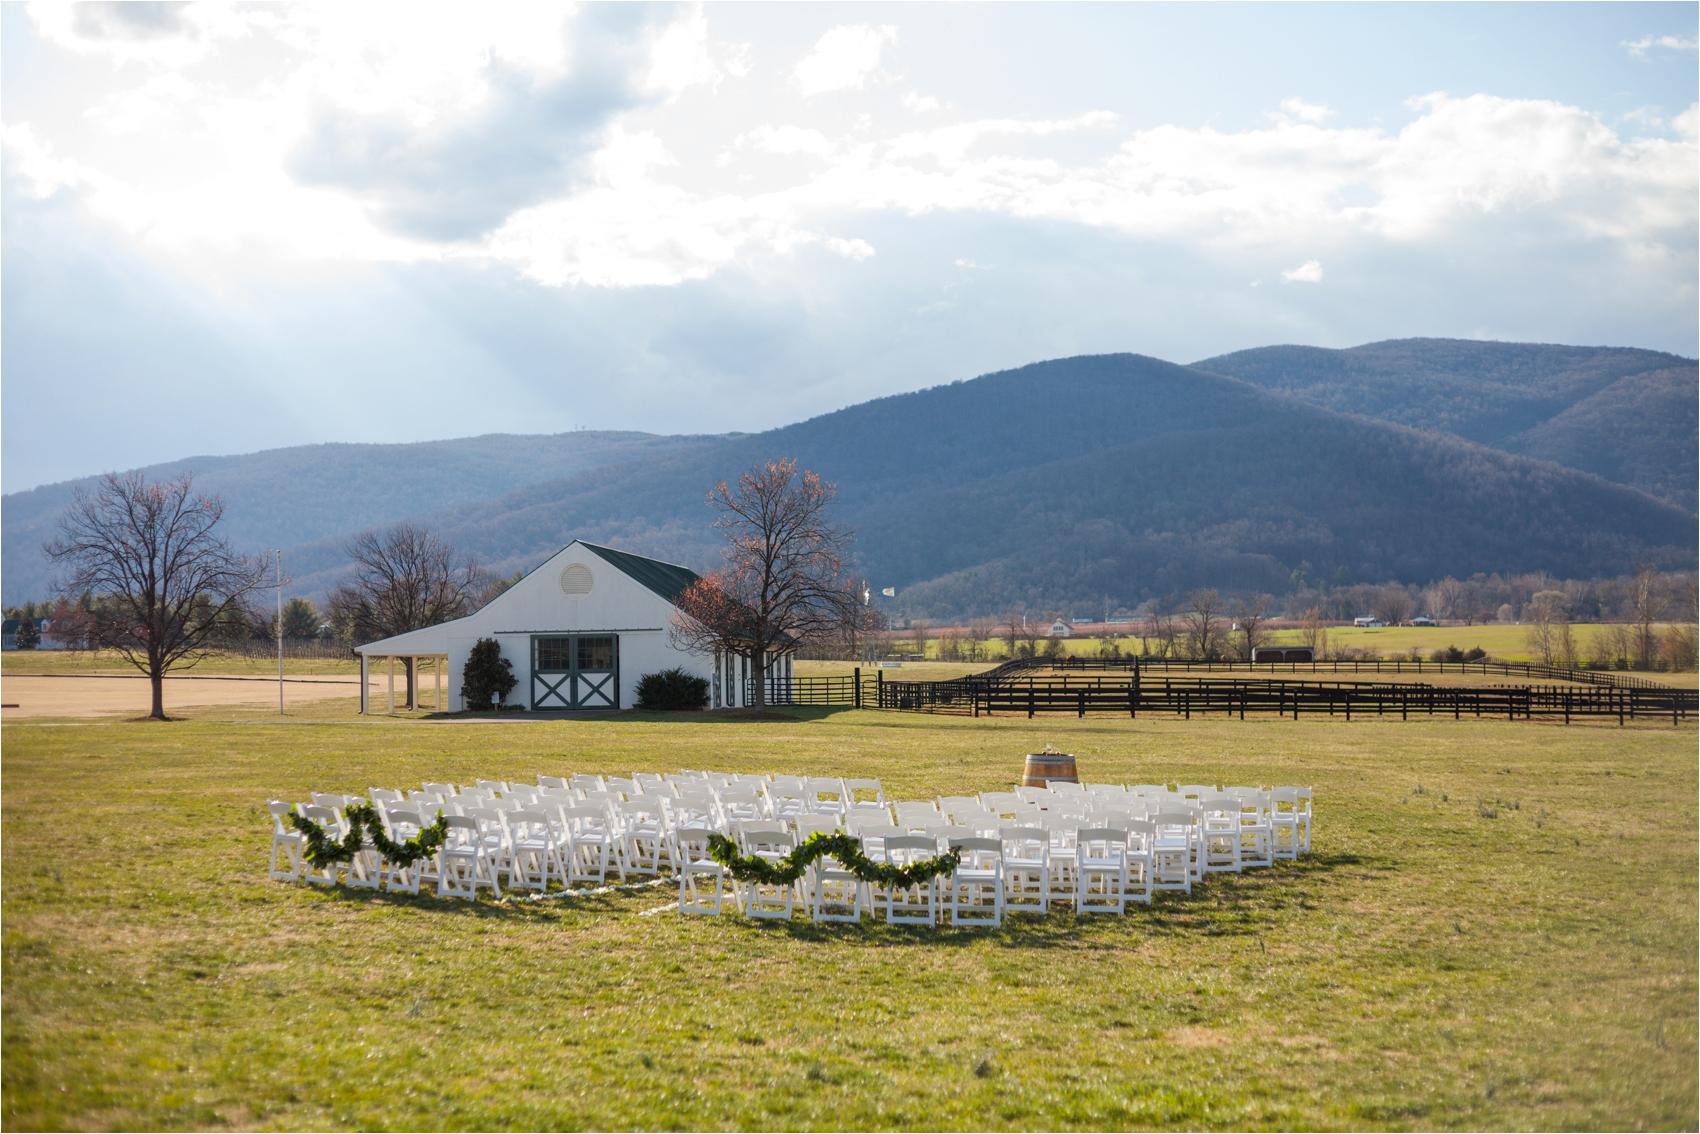 King-Family-Vineyard-Spring-Virginia-Wedding-1453.jpg